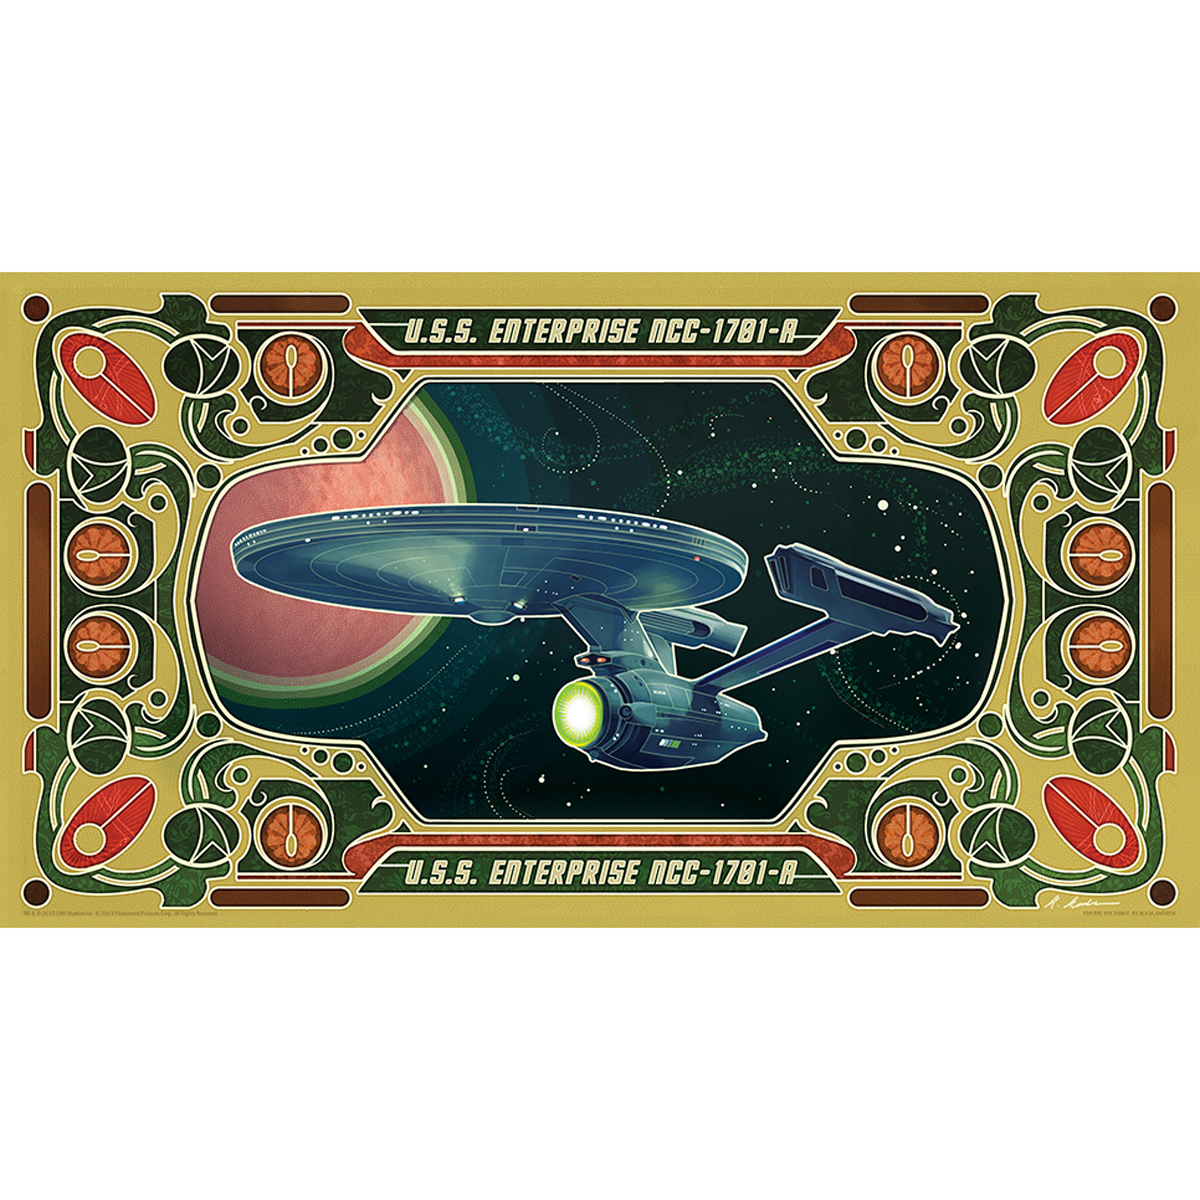 Star Trek Enterprise 1701-A Poster [13x24]